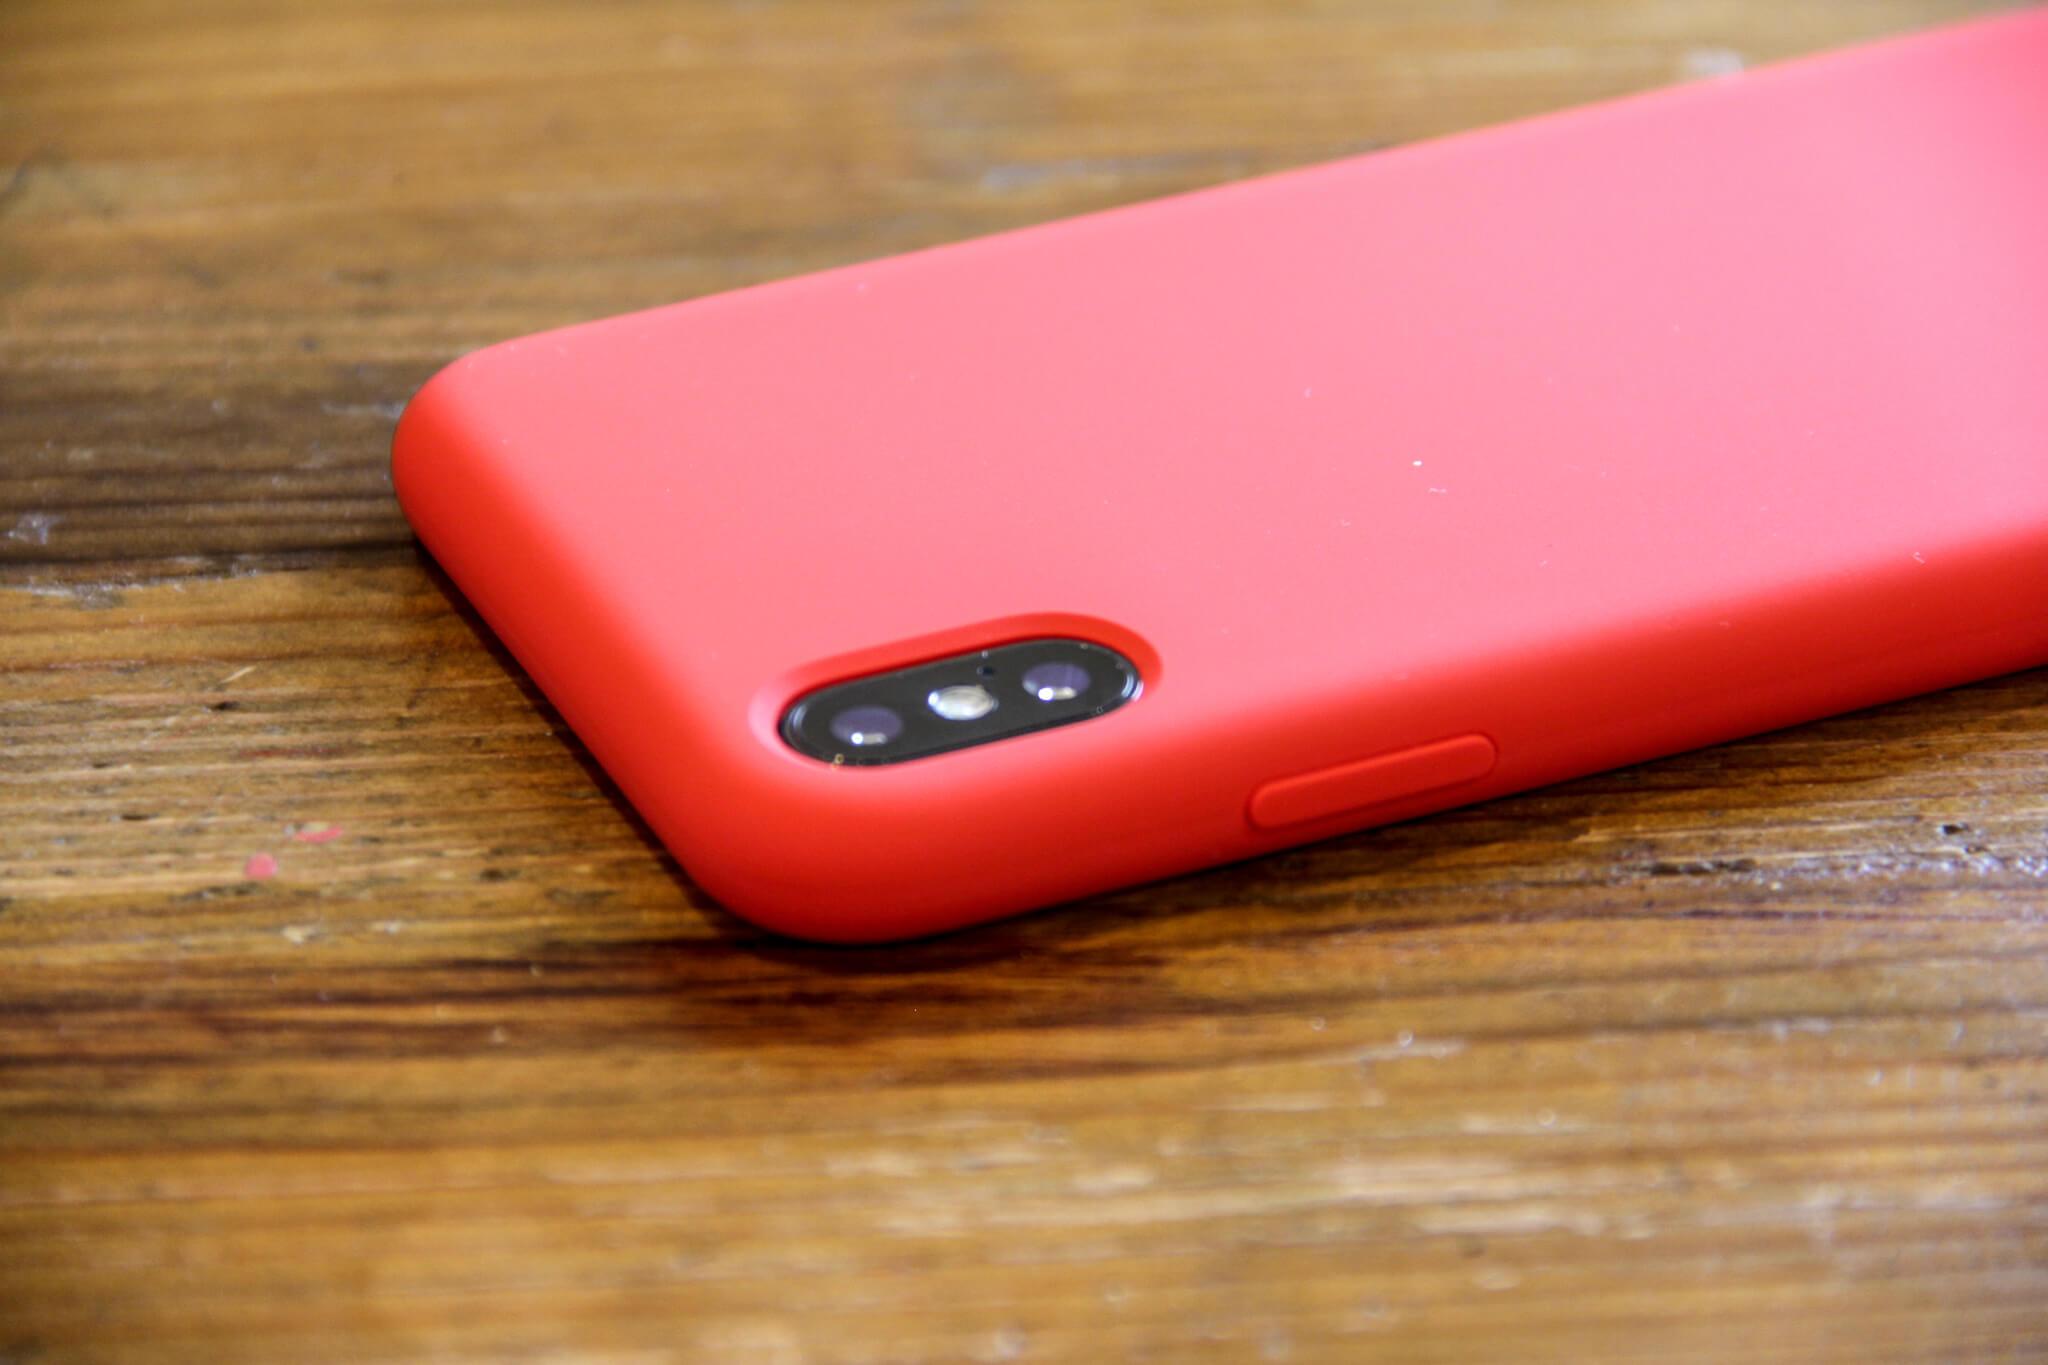 iPhone X Jasbon シリコンケース外観カメラ開口部の写真